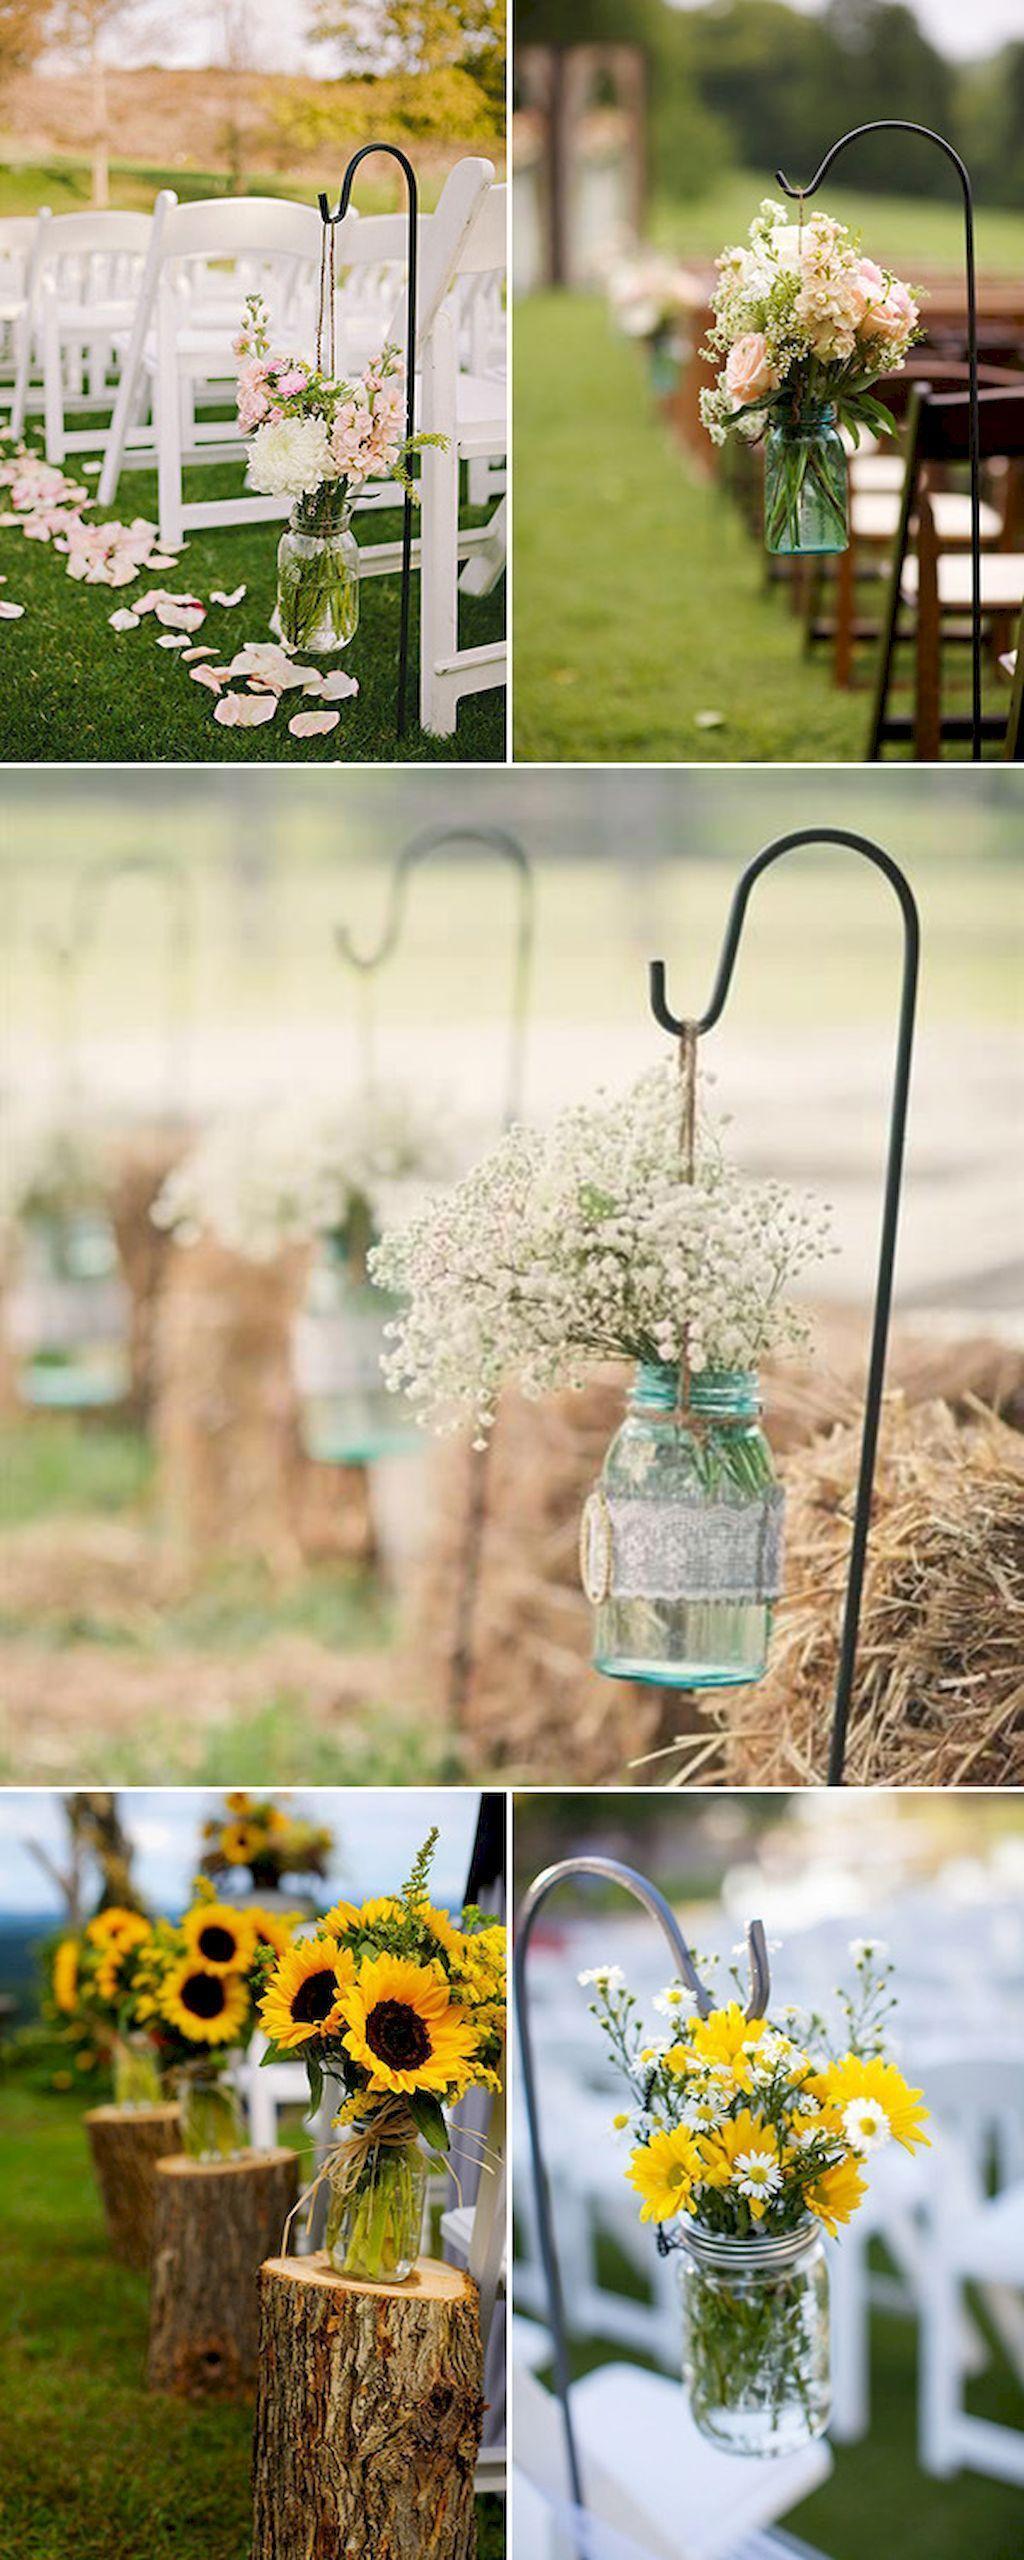 Elegant outdoor wedding decor ideas on a budget (14 ...